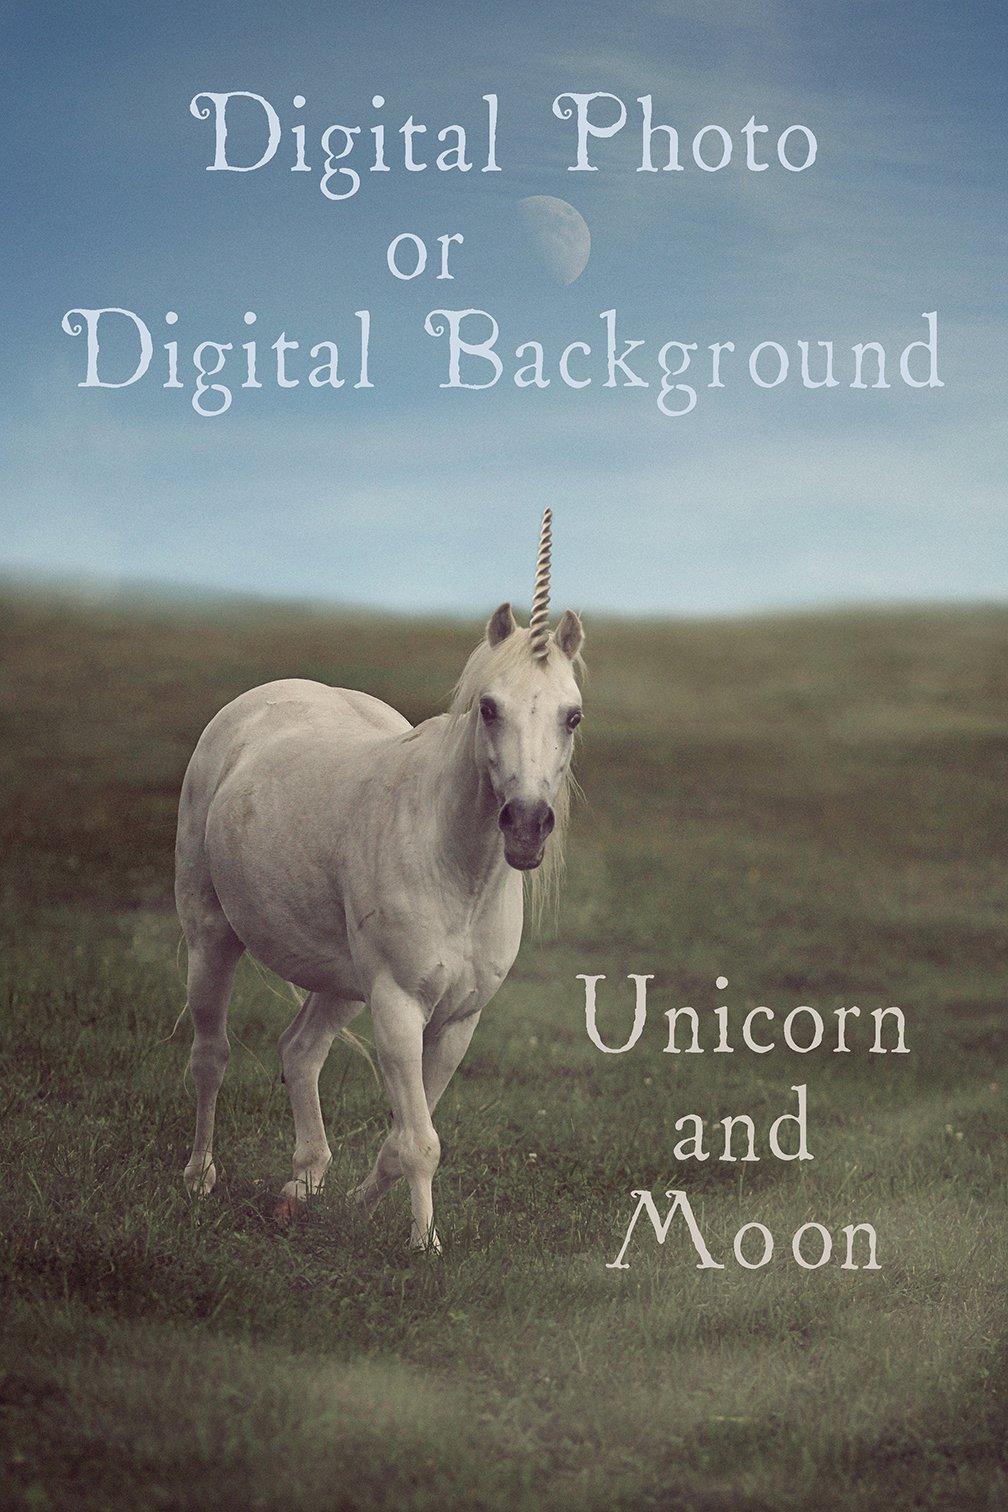 Image of Unicorn and Moon Digital Background